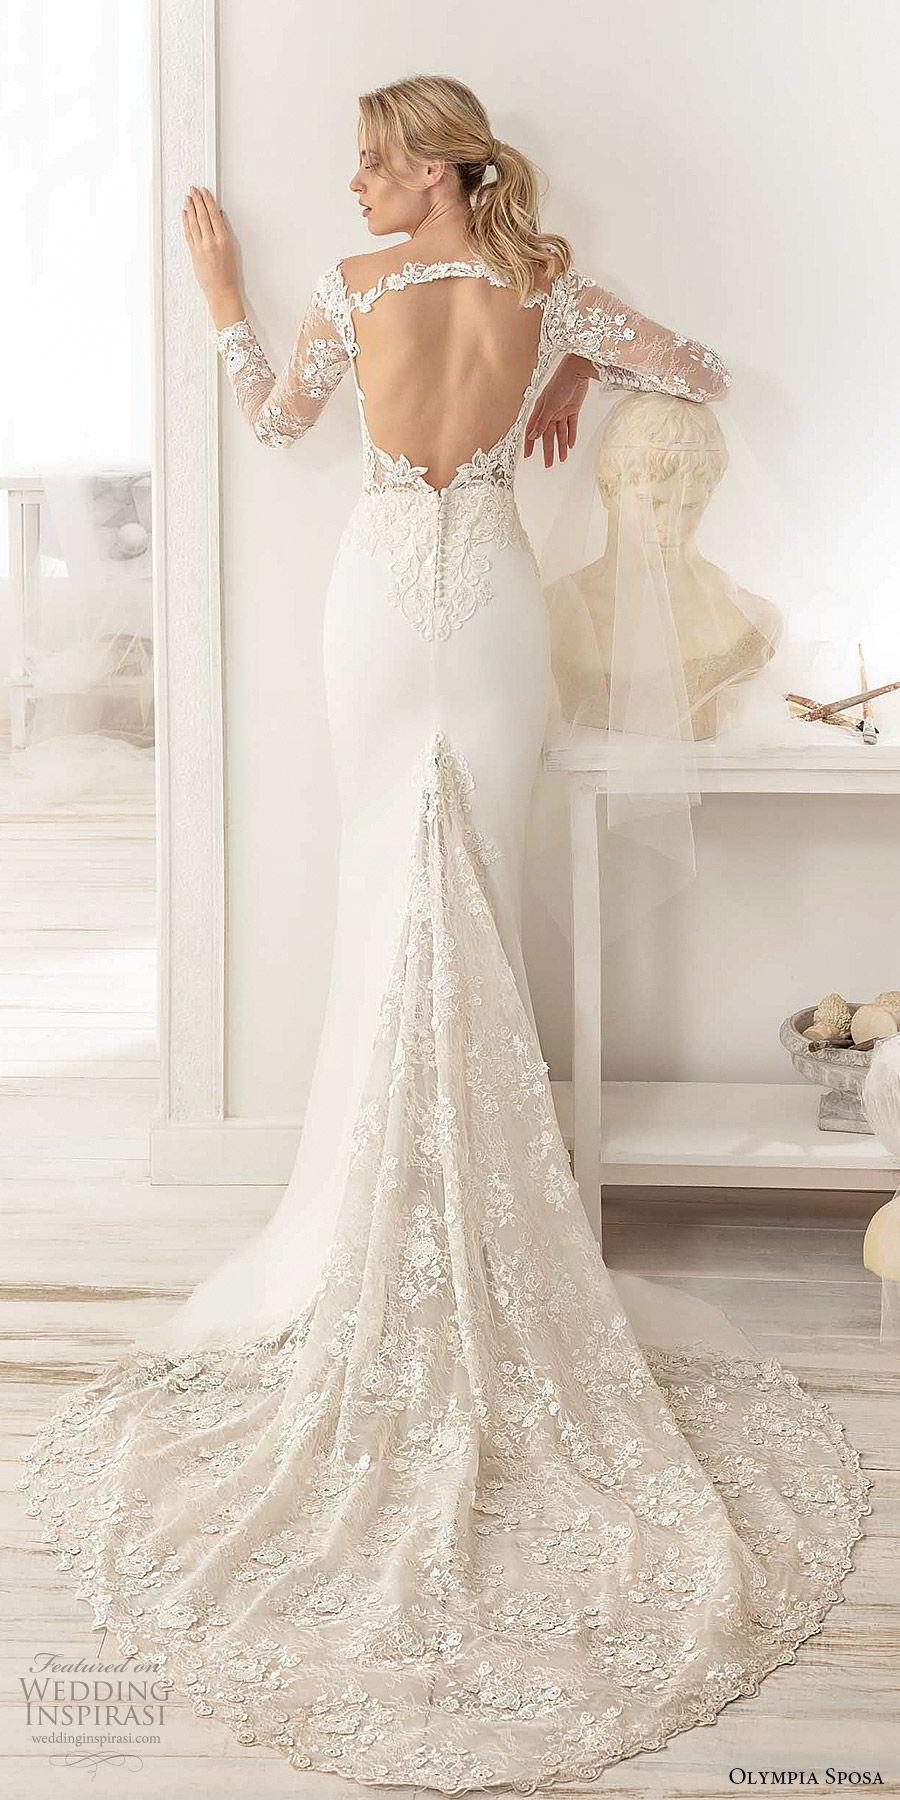 olympia sposa 2020 bridal illusion long sleeve off shoulder sweetheart sheer lace embellished bodice sheath wedding dress (2) elegant romantic keyhole back chapel train bv